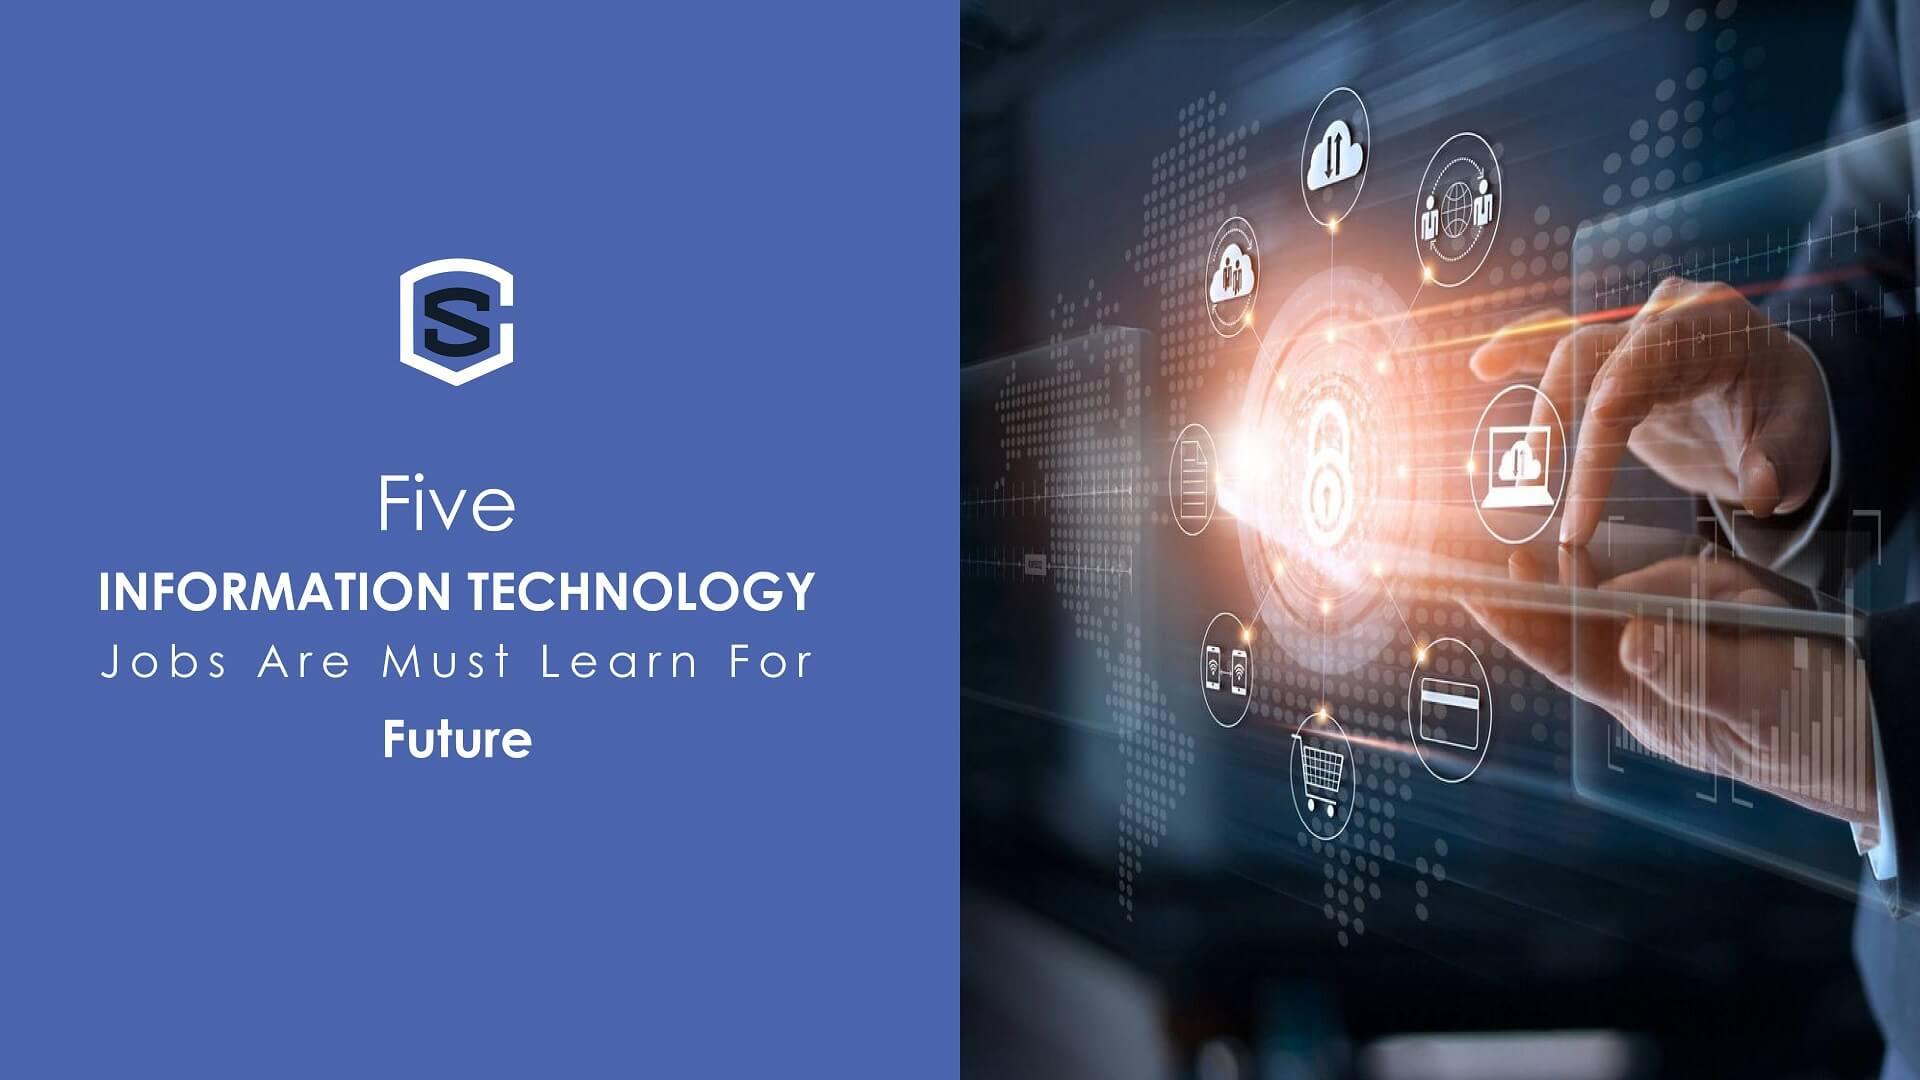 Five Information Technology Jobs